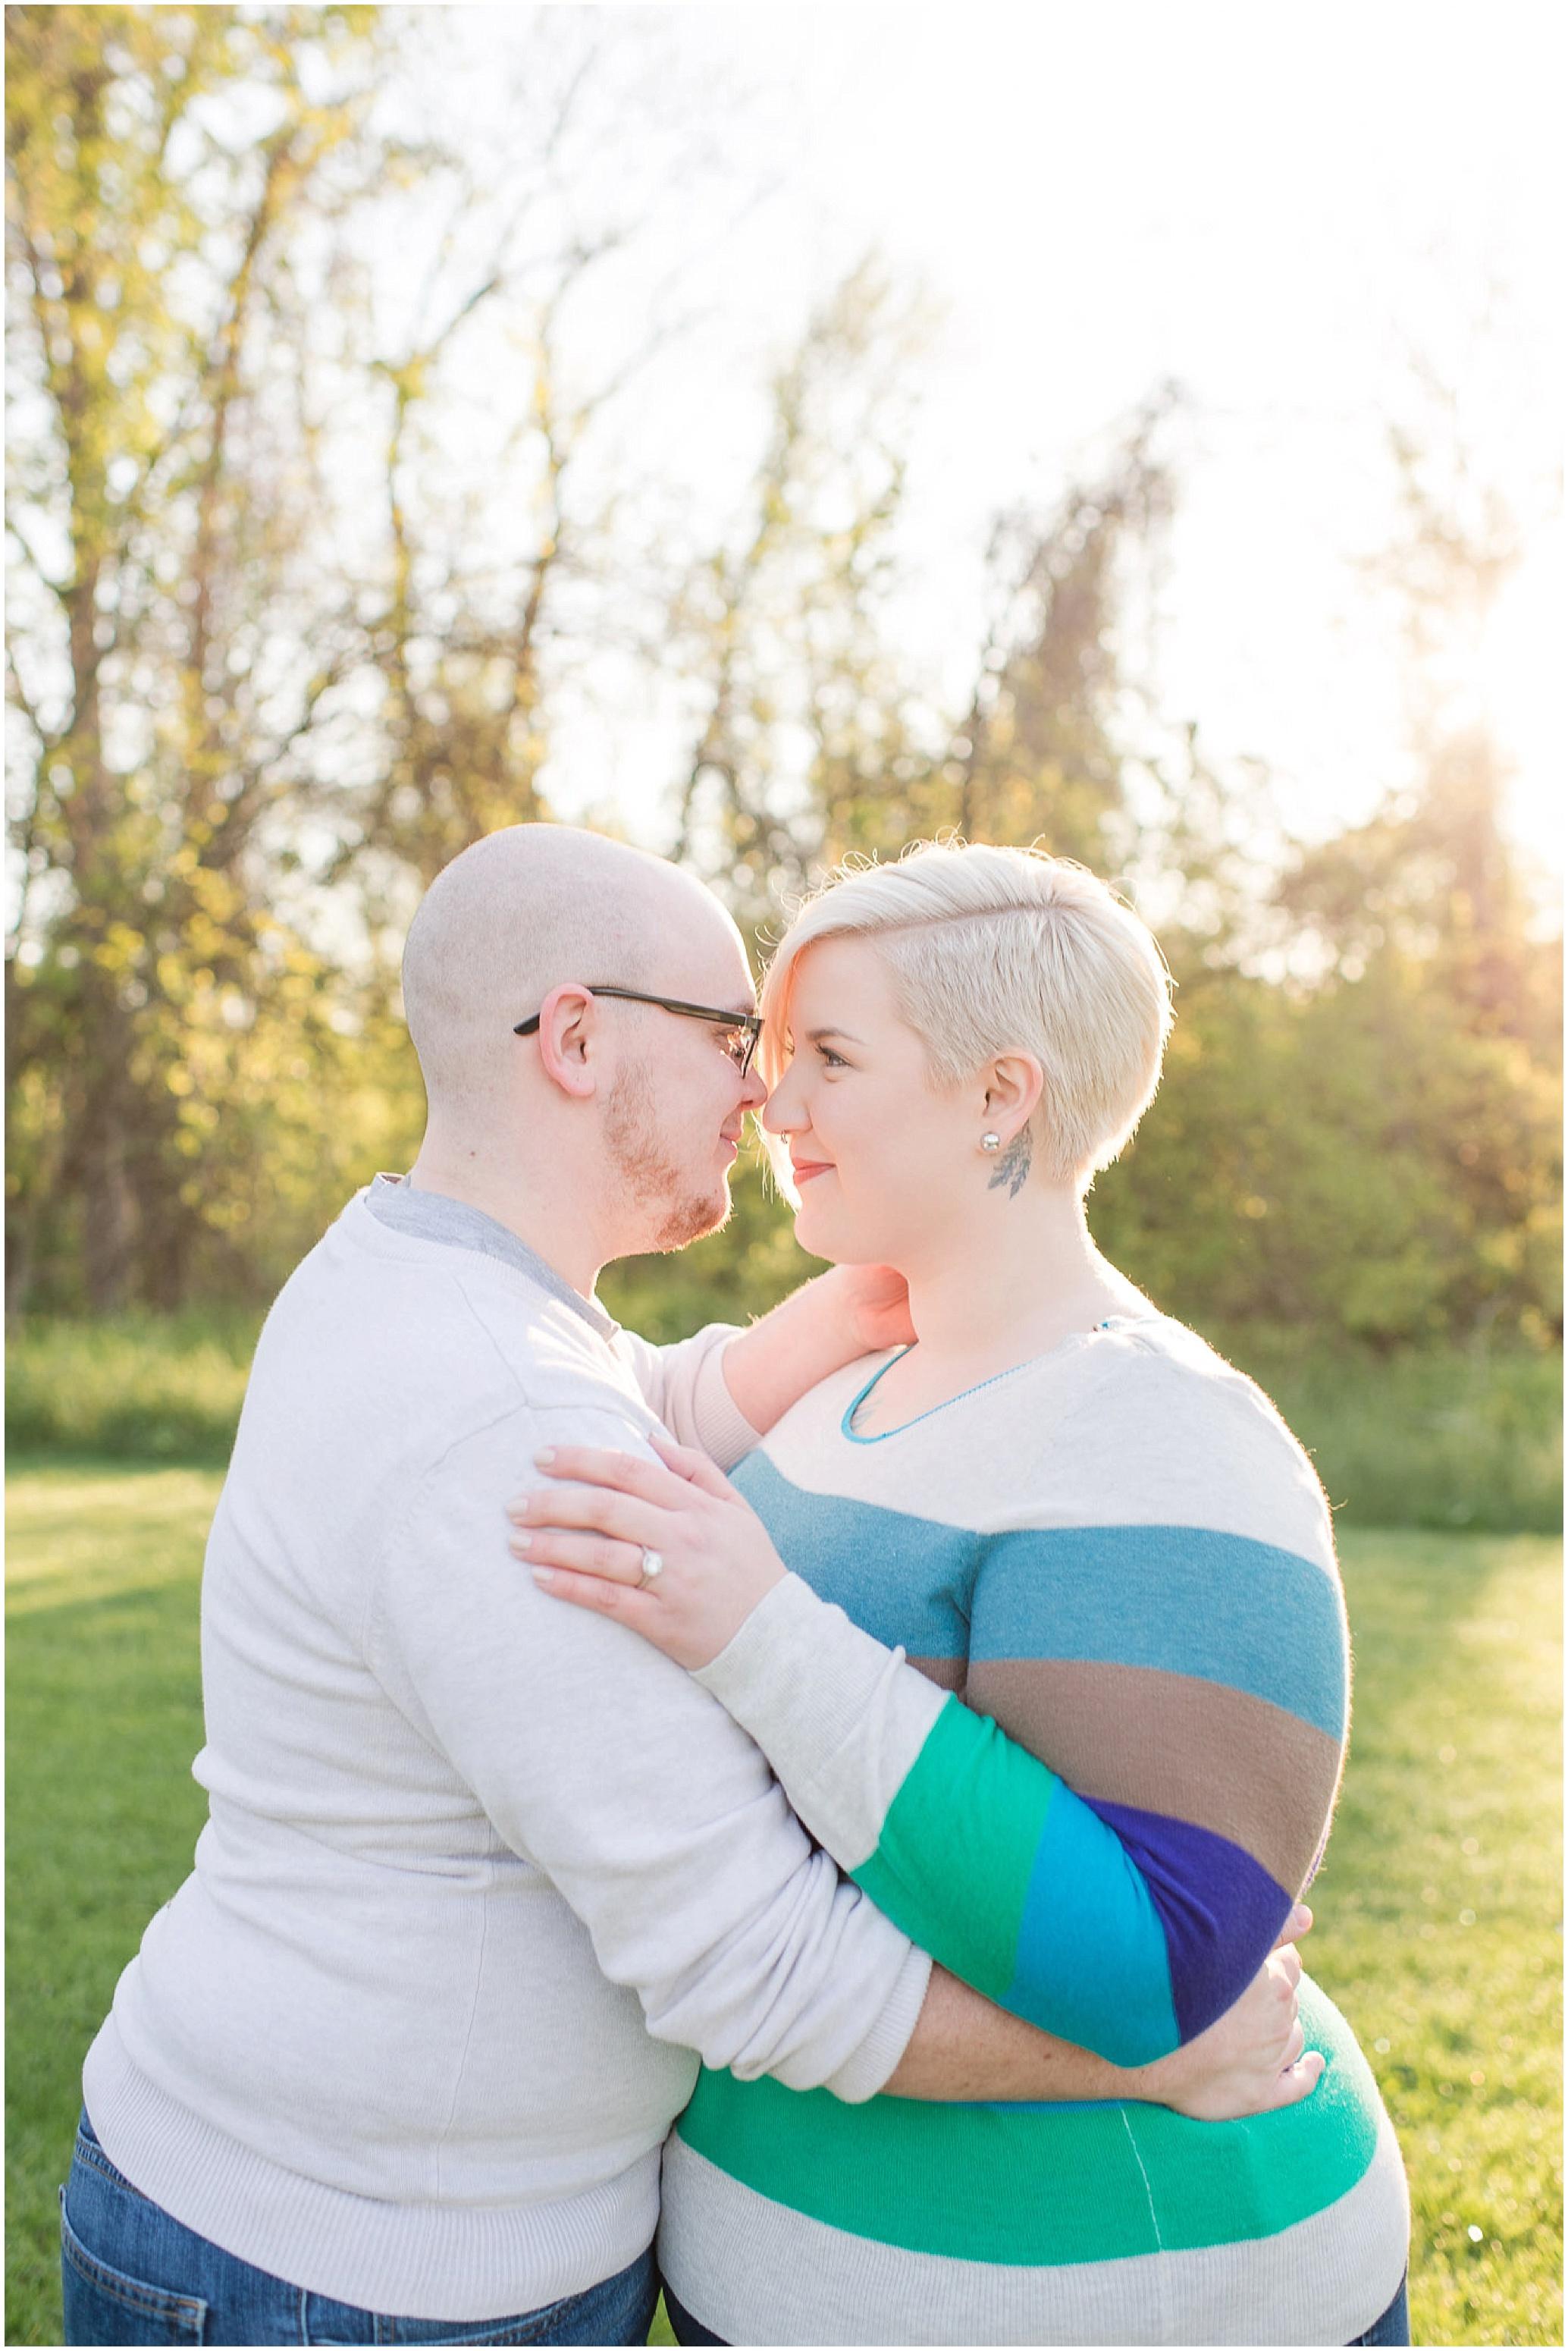 Hannah Leigh Photography Weddings and Engagements Baltimore Maryland_0019.jpg